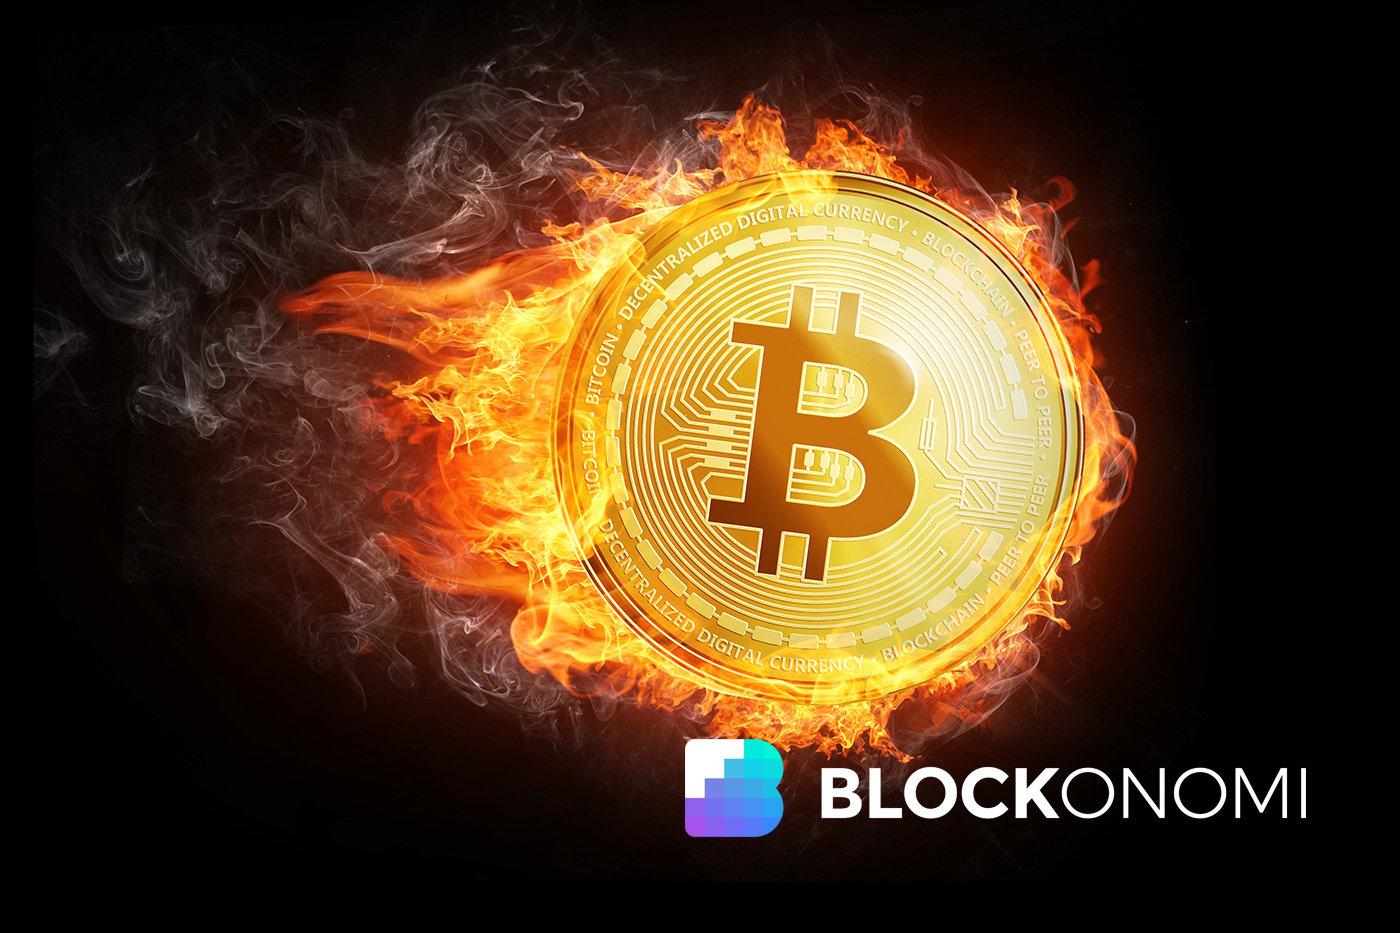 https%3A%2F%2Fblockonomi 9fcd.kxcdn.com%2Fwp content%2Fuploads%2F2019%2F02%2Fbitcoin price gain